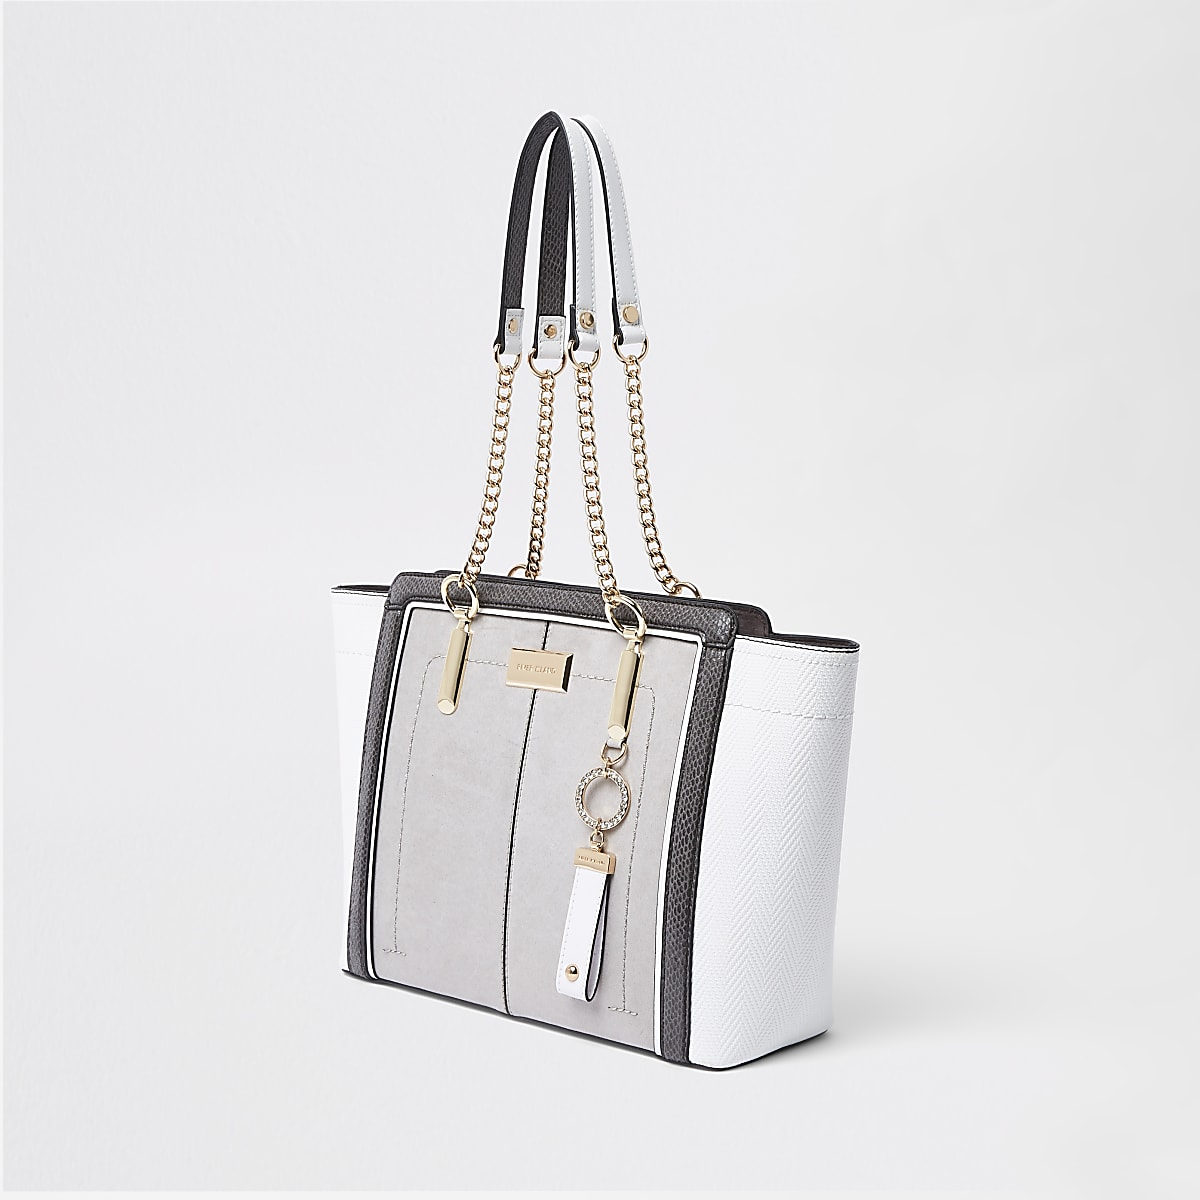 22184fbab51 Light grey winged chain handle tote bag - Shopper & Tote Bags - Bags &  Purses - women